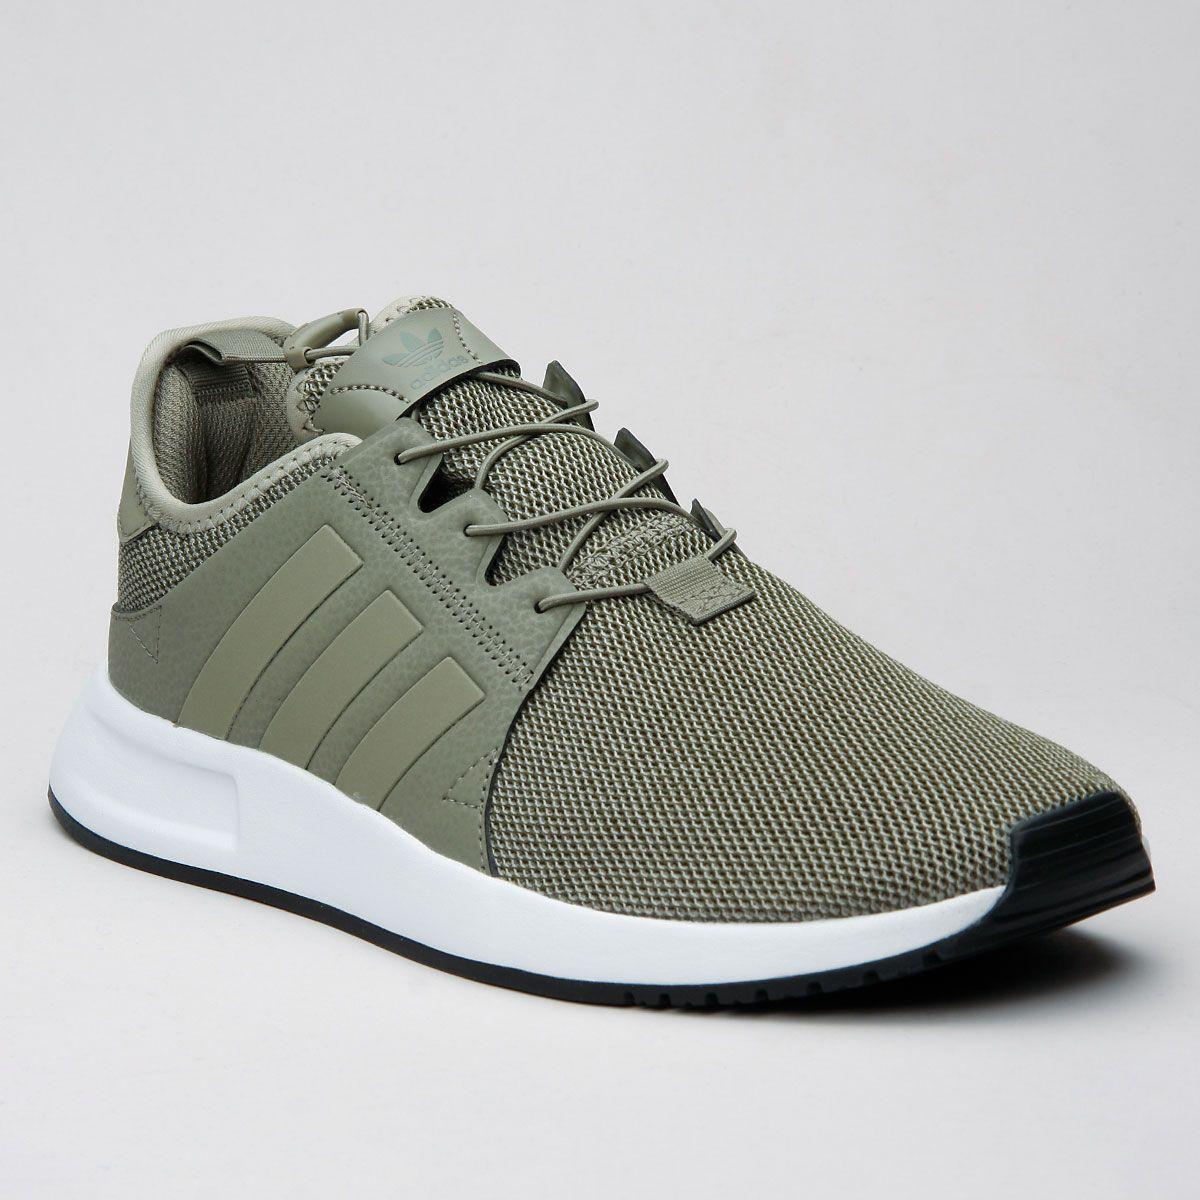 Adidas originals x_plr baskets basses trace cargotrace